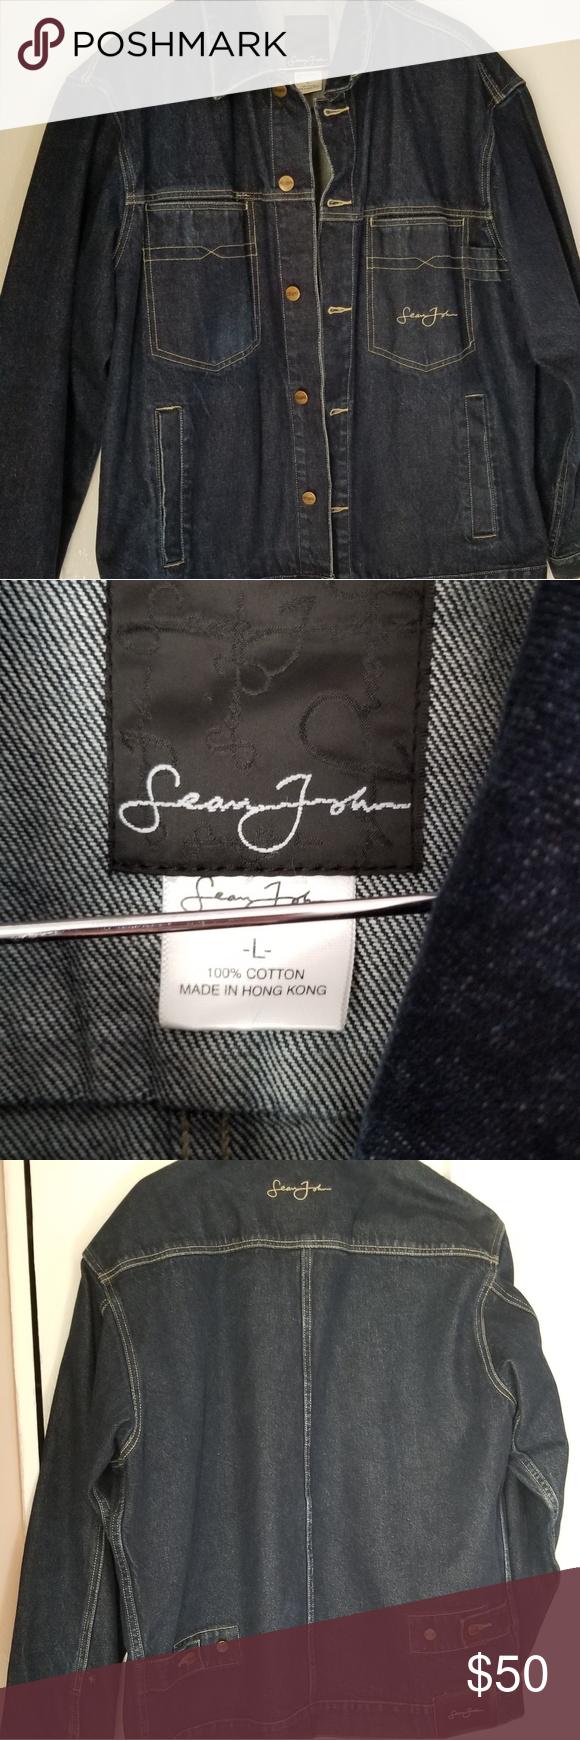 3 30 Sean John Jean Jacket Men S Large Jean Jacket Men Sean John Jeans Mens Jackets [ 1740 x 580 Pixel ]